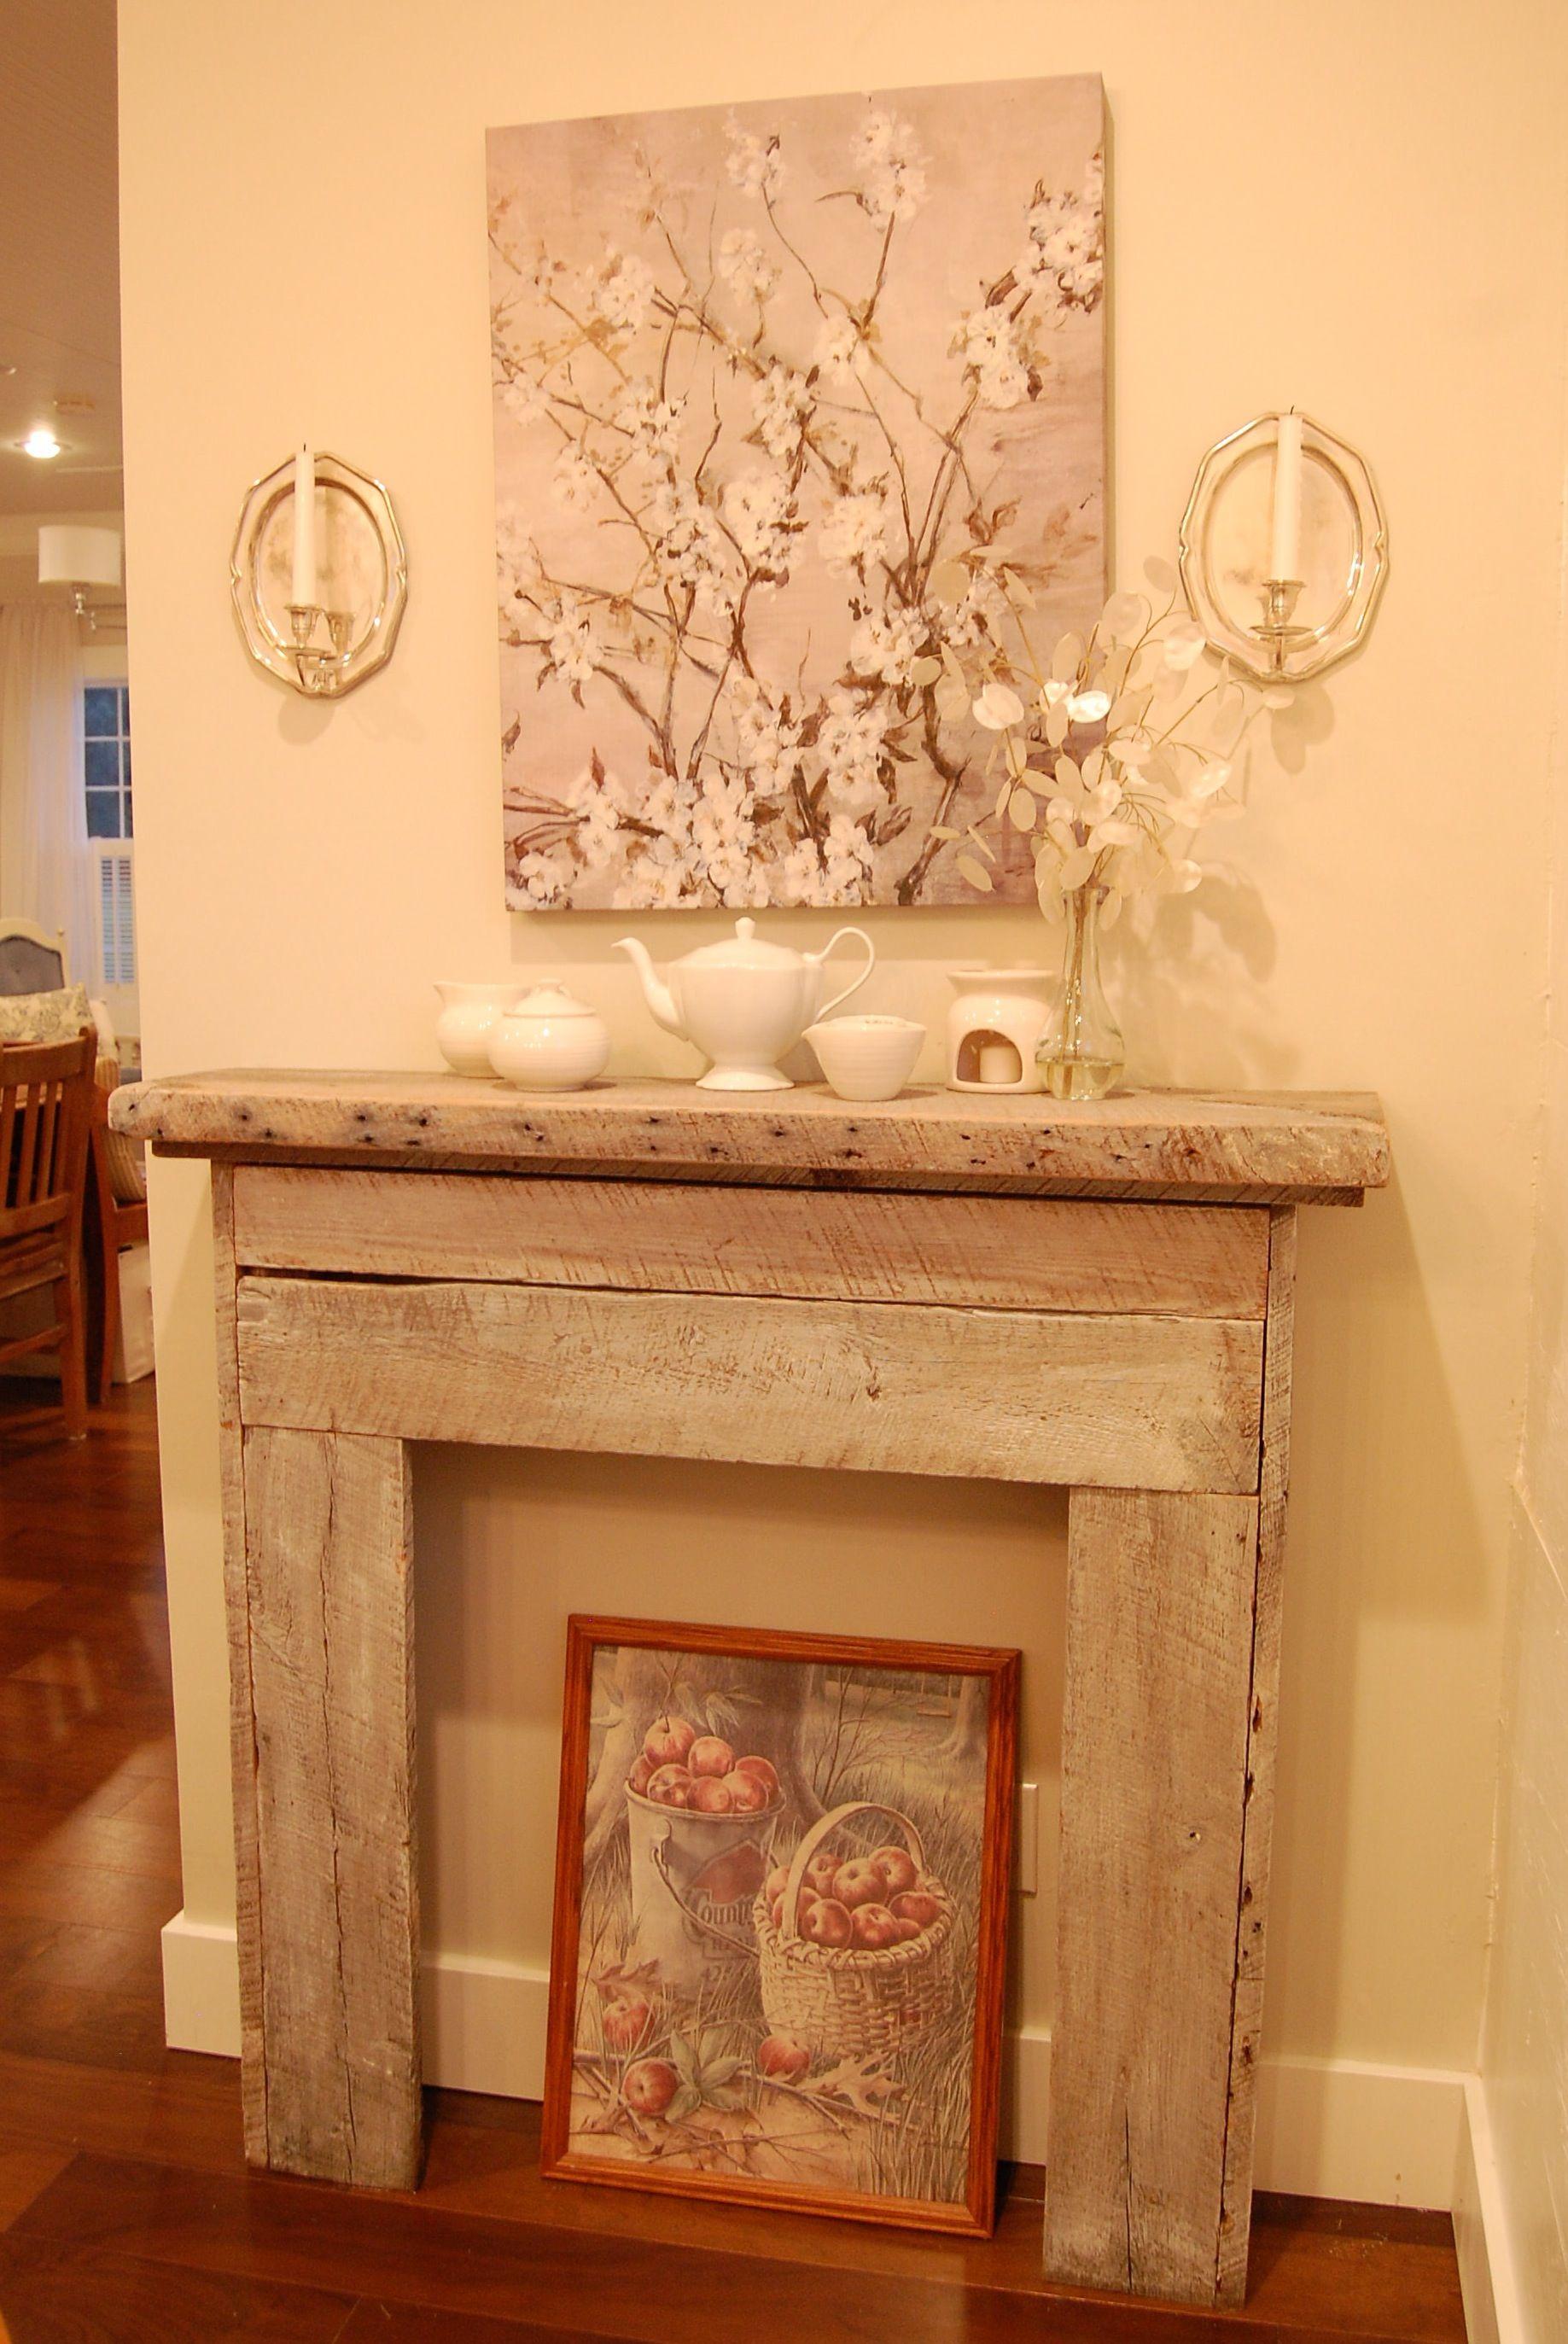 Faux Mantel Built From Reclaimed Old Barnwood. Gefälschte Kamin KaminverkleidungenKamin UmgibtKaminePallet FireplaceFireplace IdeasFaux ...